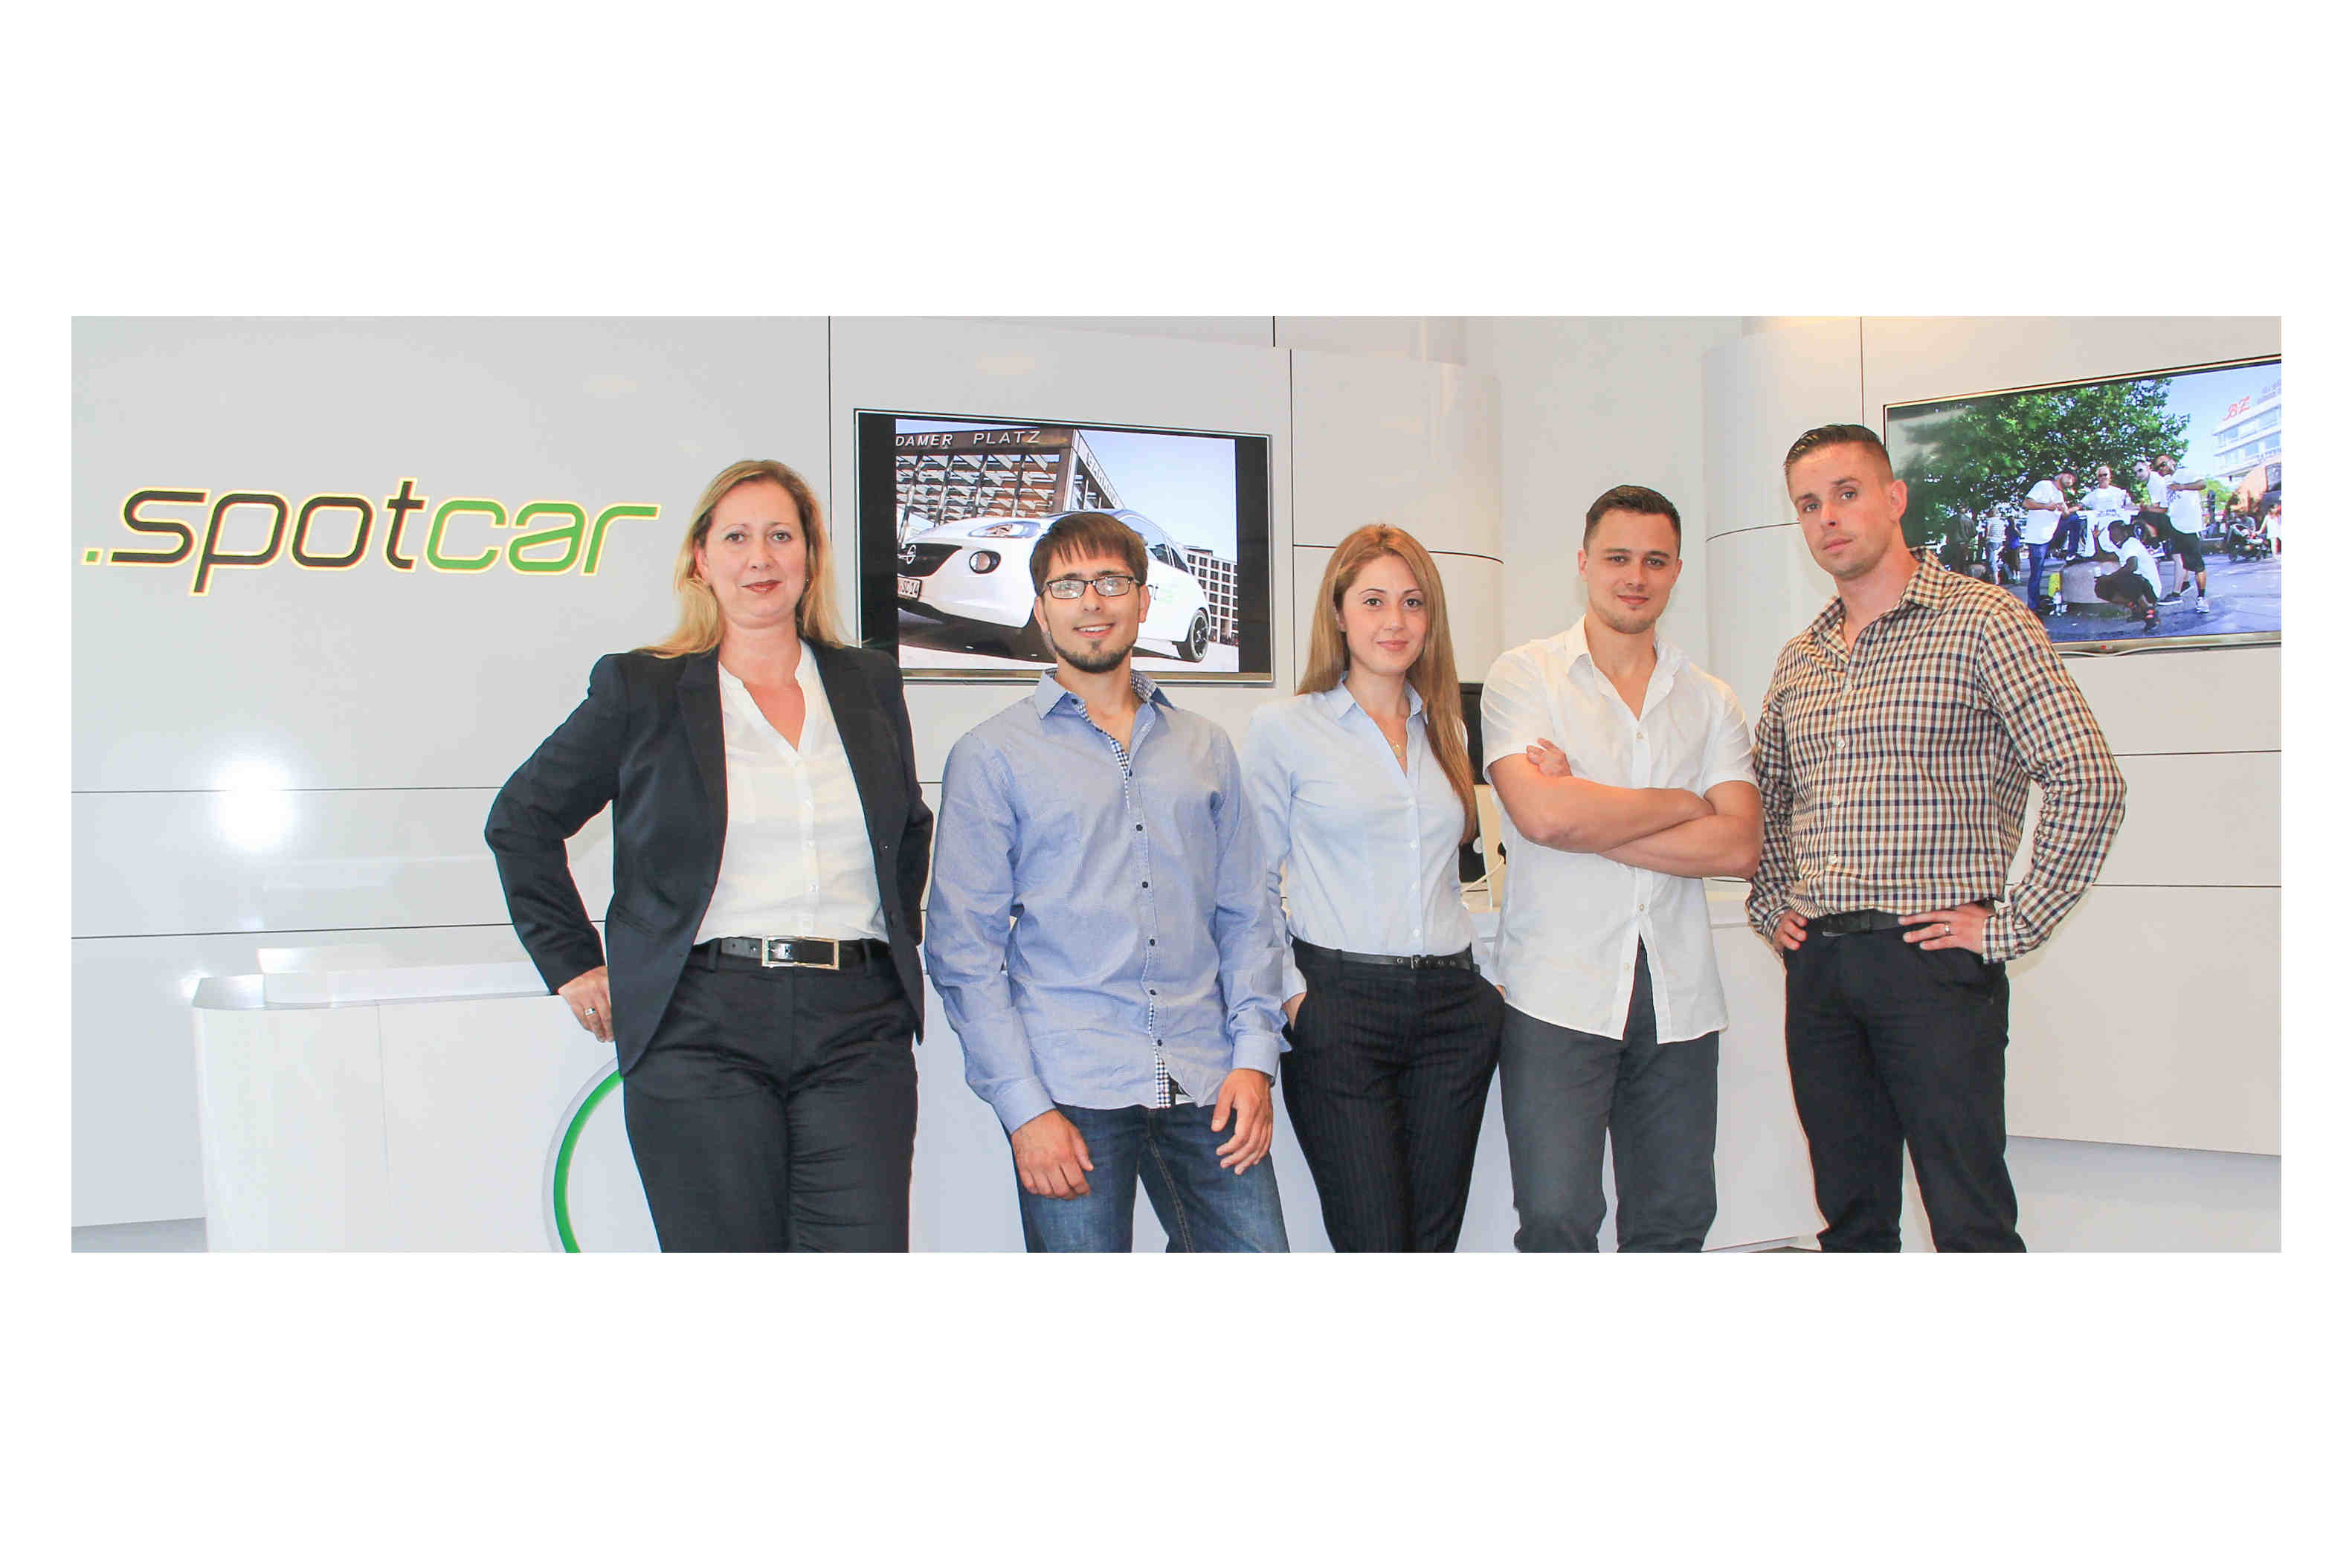 Spotcar Team